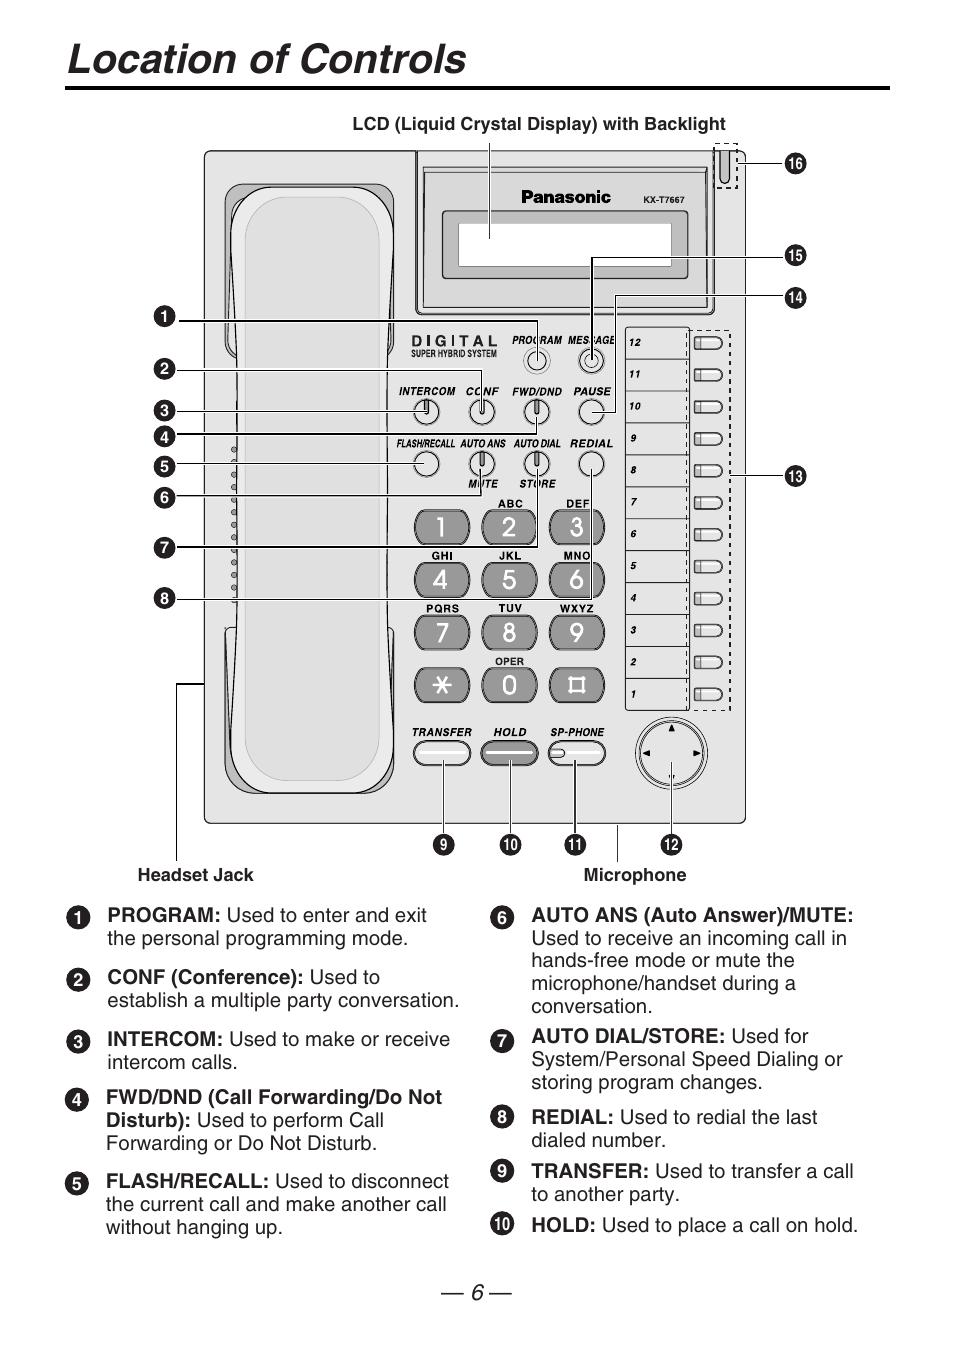 Reliance Controls 10 Manual Guide